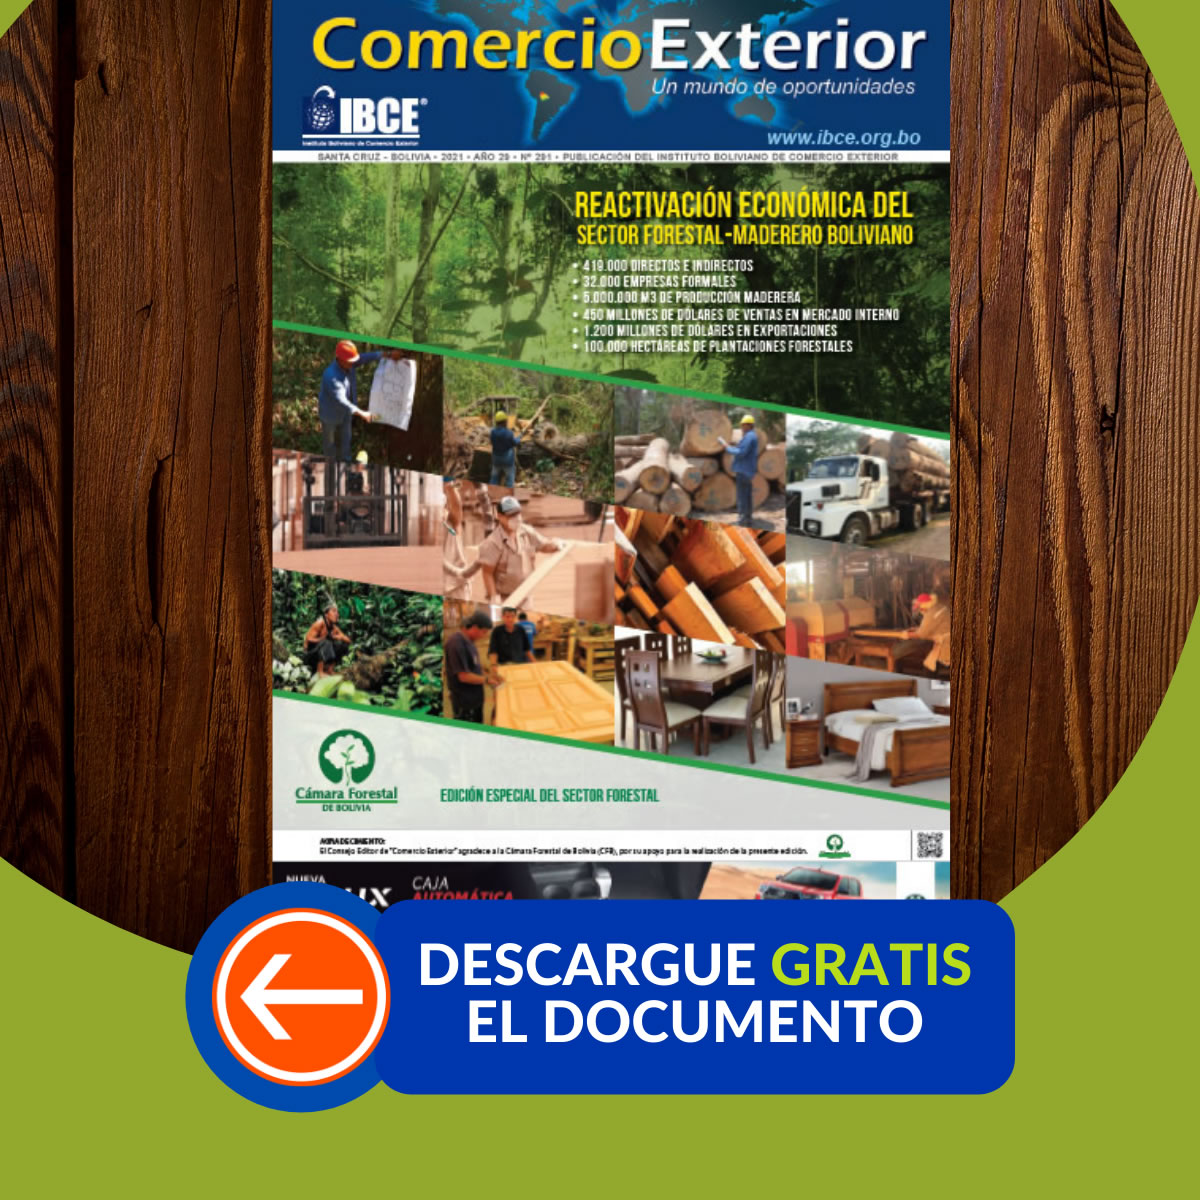 DESCARGA GRATIS: Reactivación Económica del Sector Forestal - Maderero Boliviano